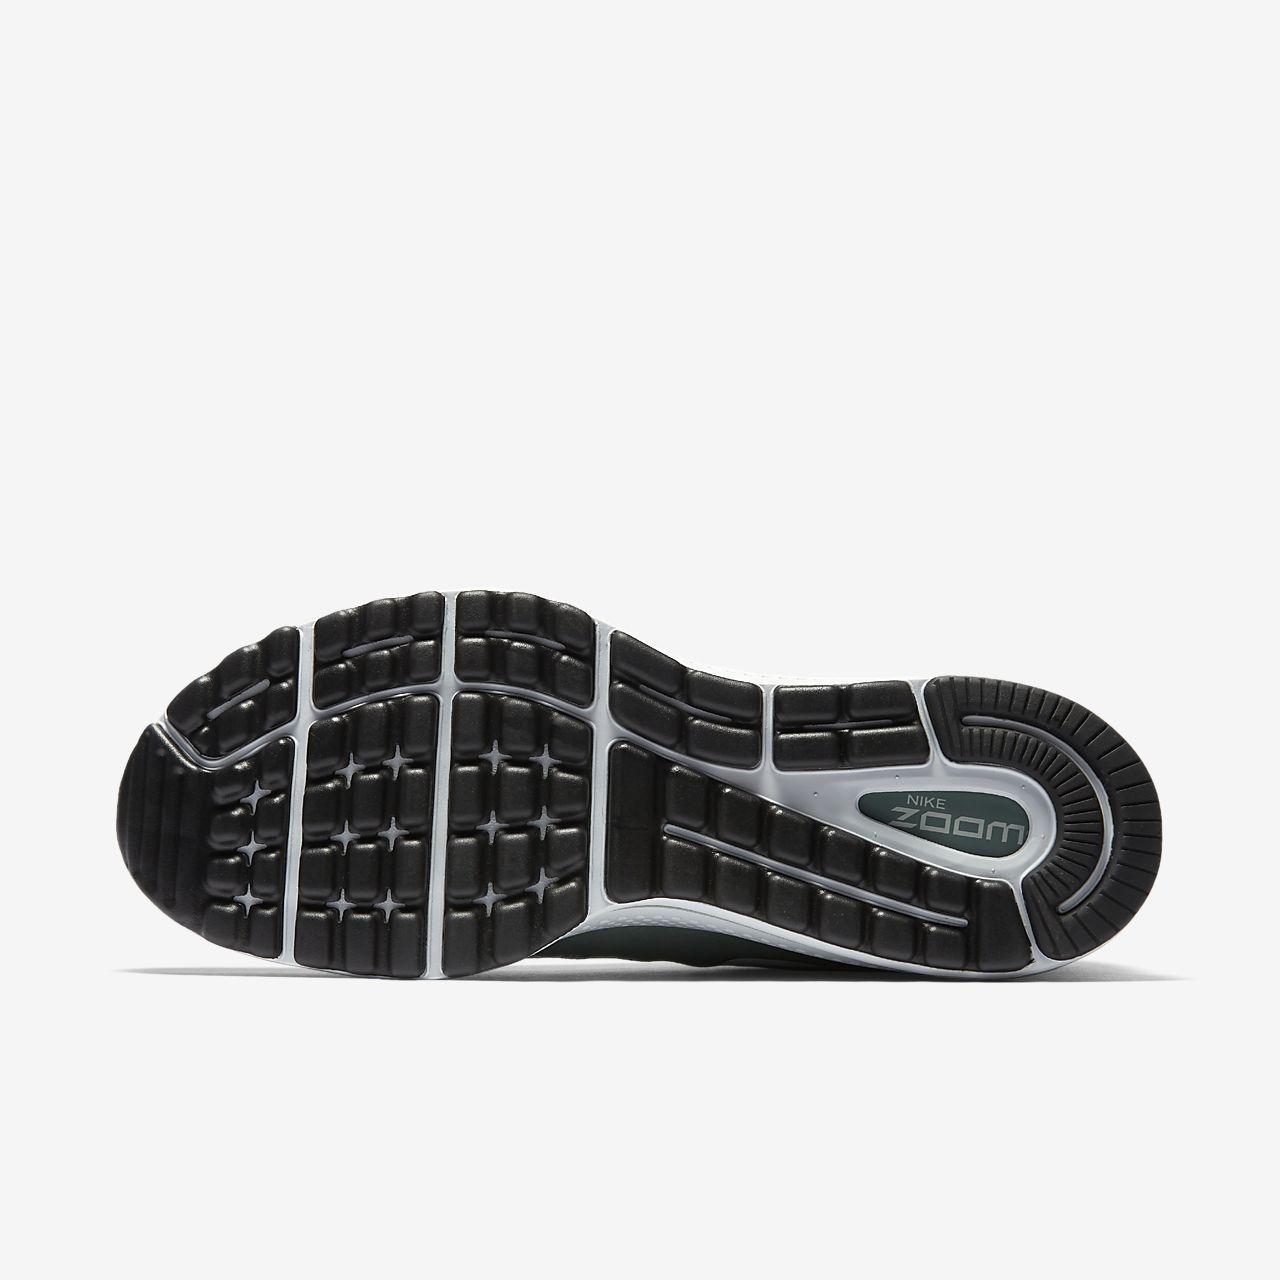 46ab22d1c55bc Nike Air Zoom Vomero 13 Men s Running Shoe. Nike.com DK